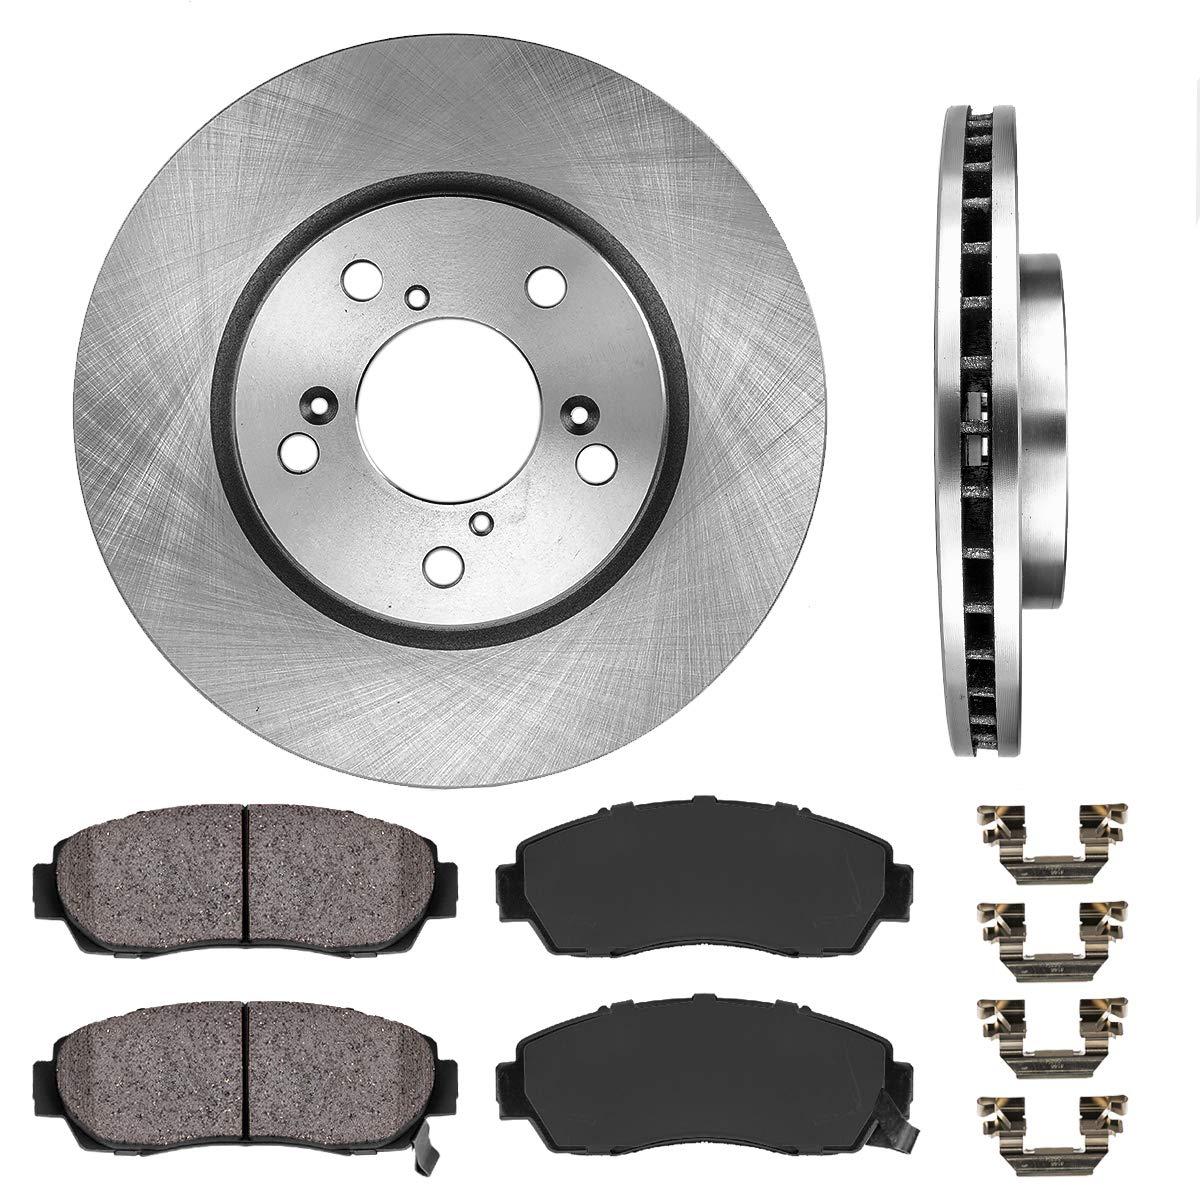 For Honda Accord Crosstour Front Rear Black Drilled Brake Rotors+Ceramic Pads